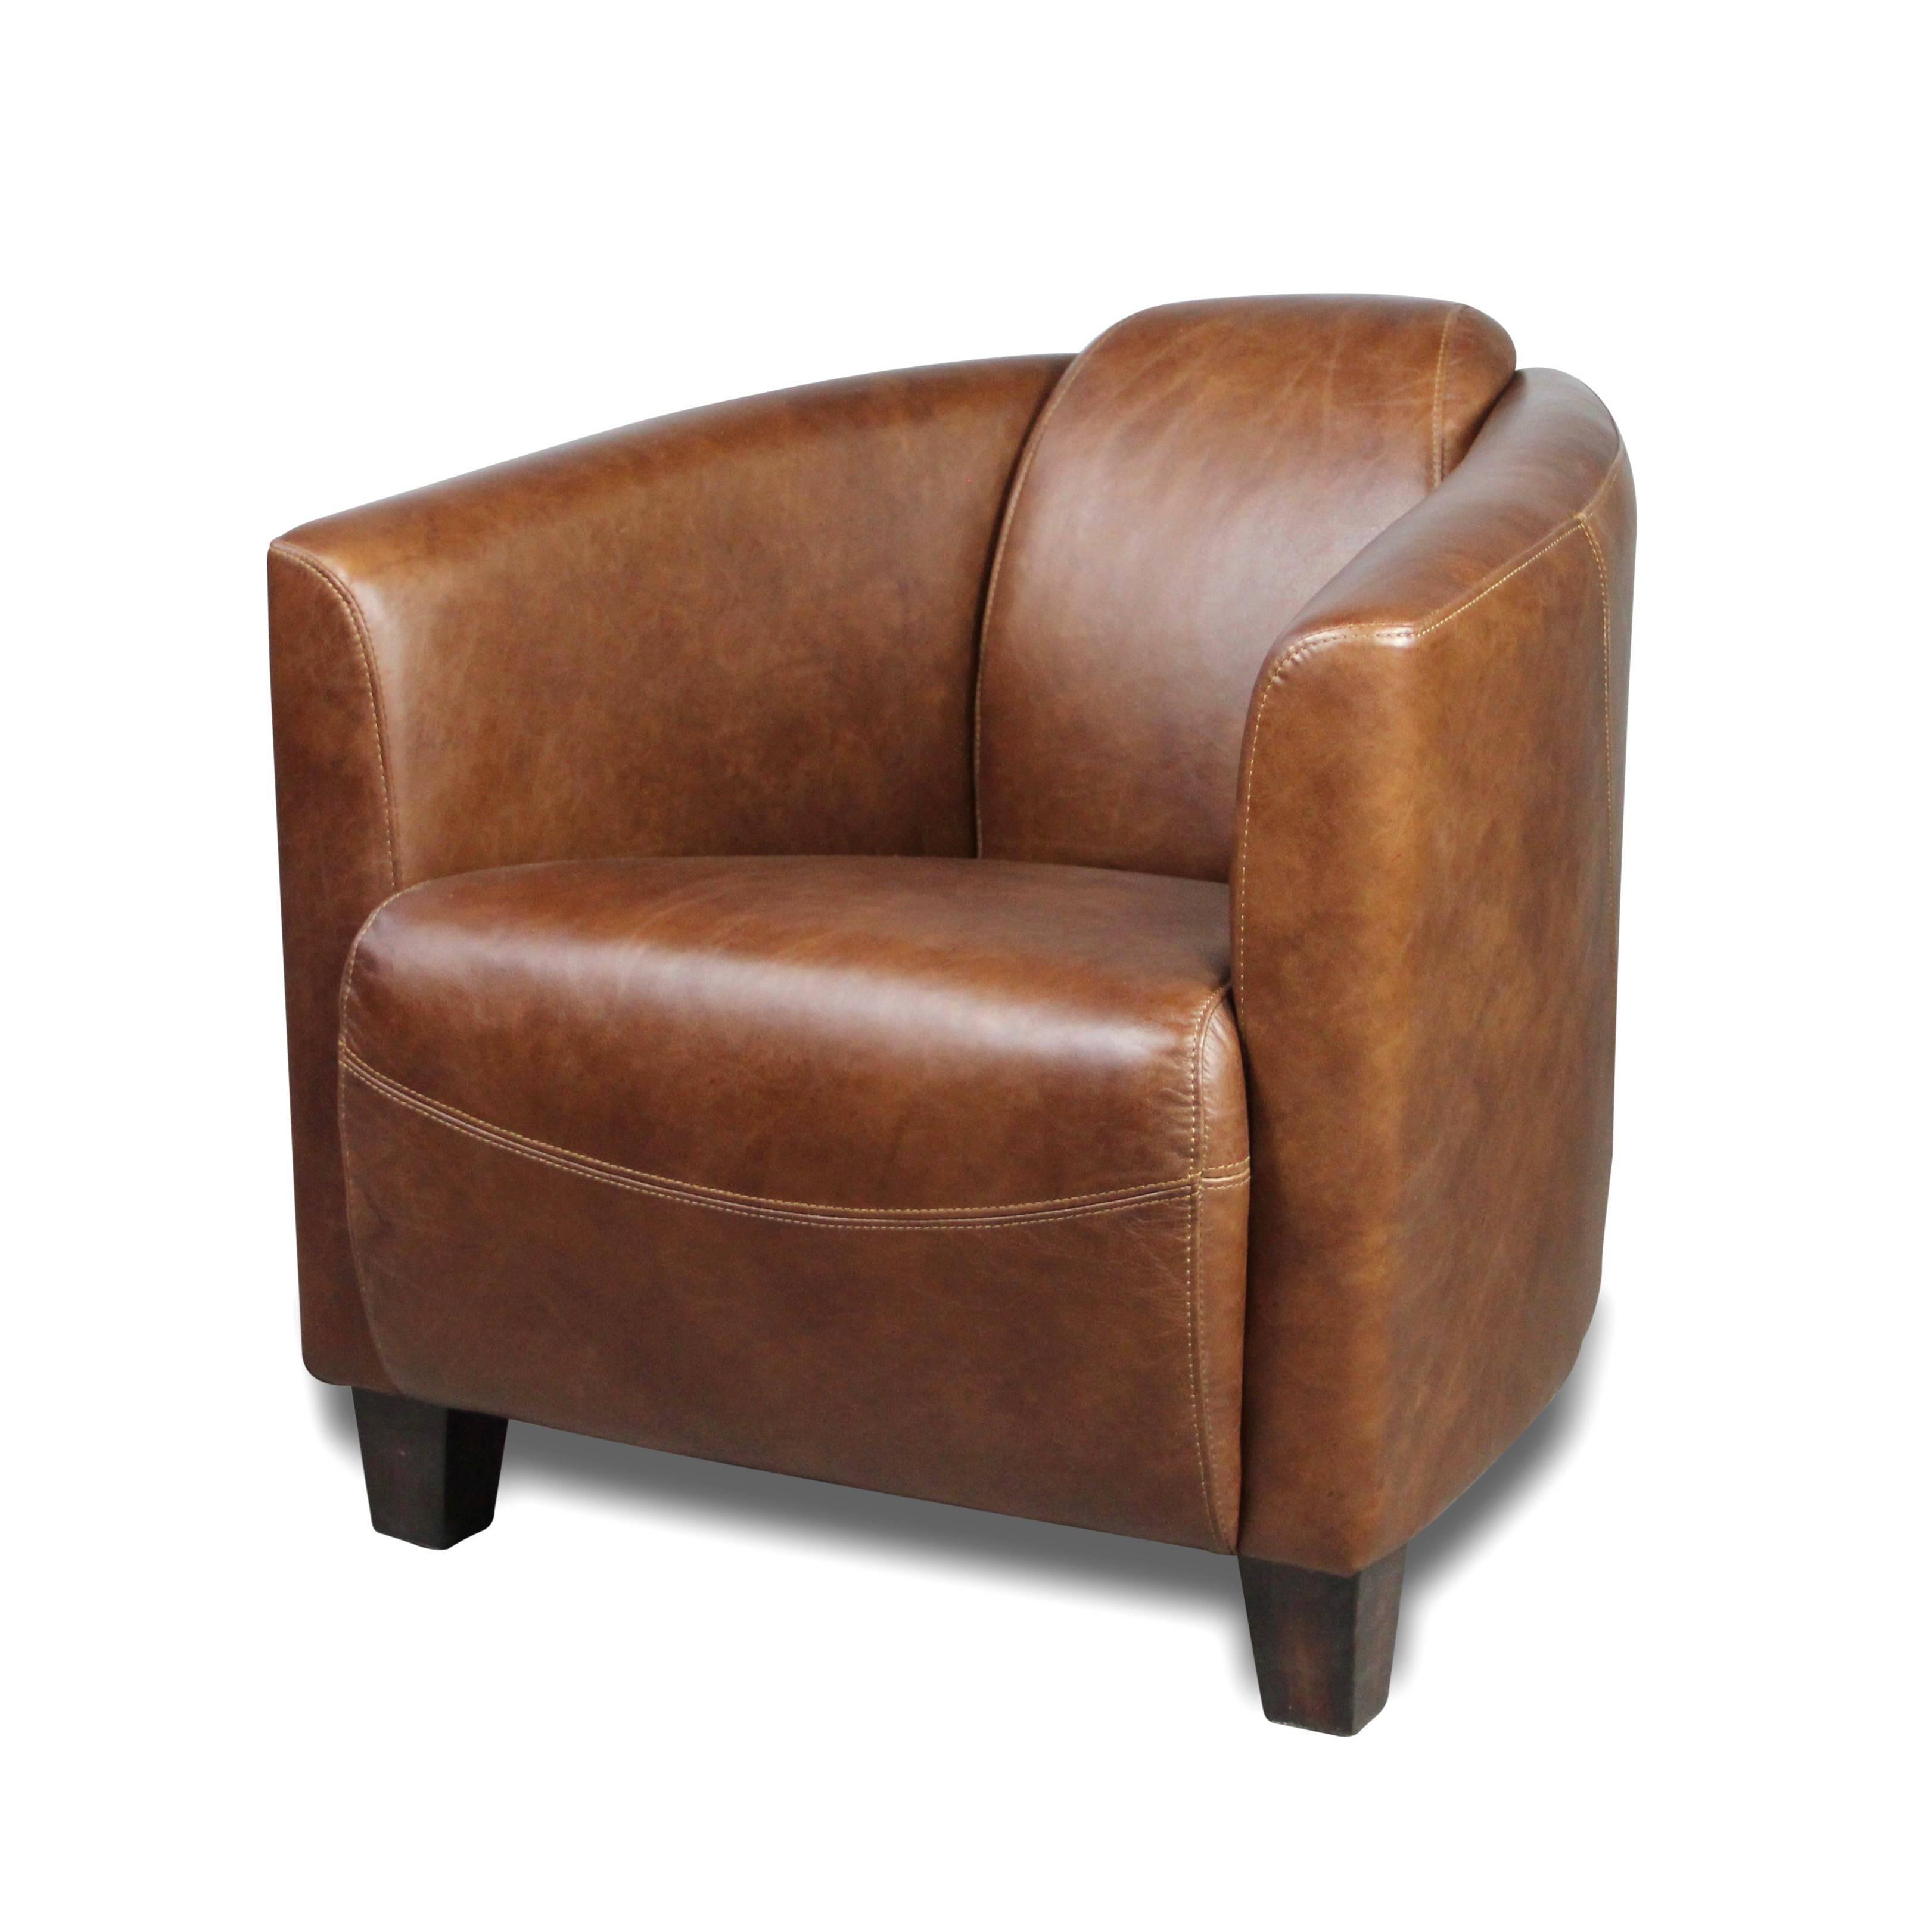 Fauteuil Club Vintage En Cuir Patine Vintage Marron Clair Style Design